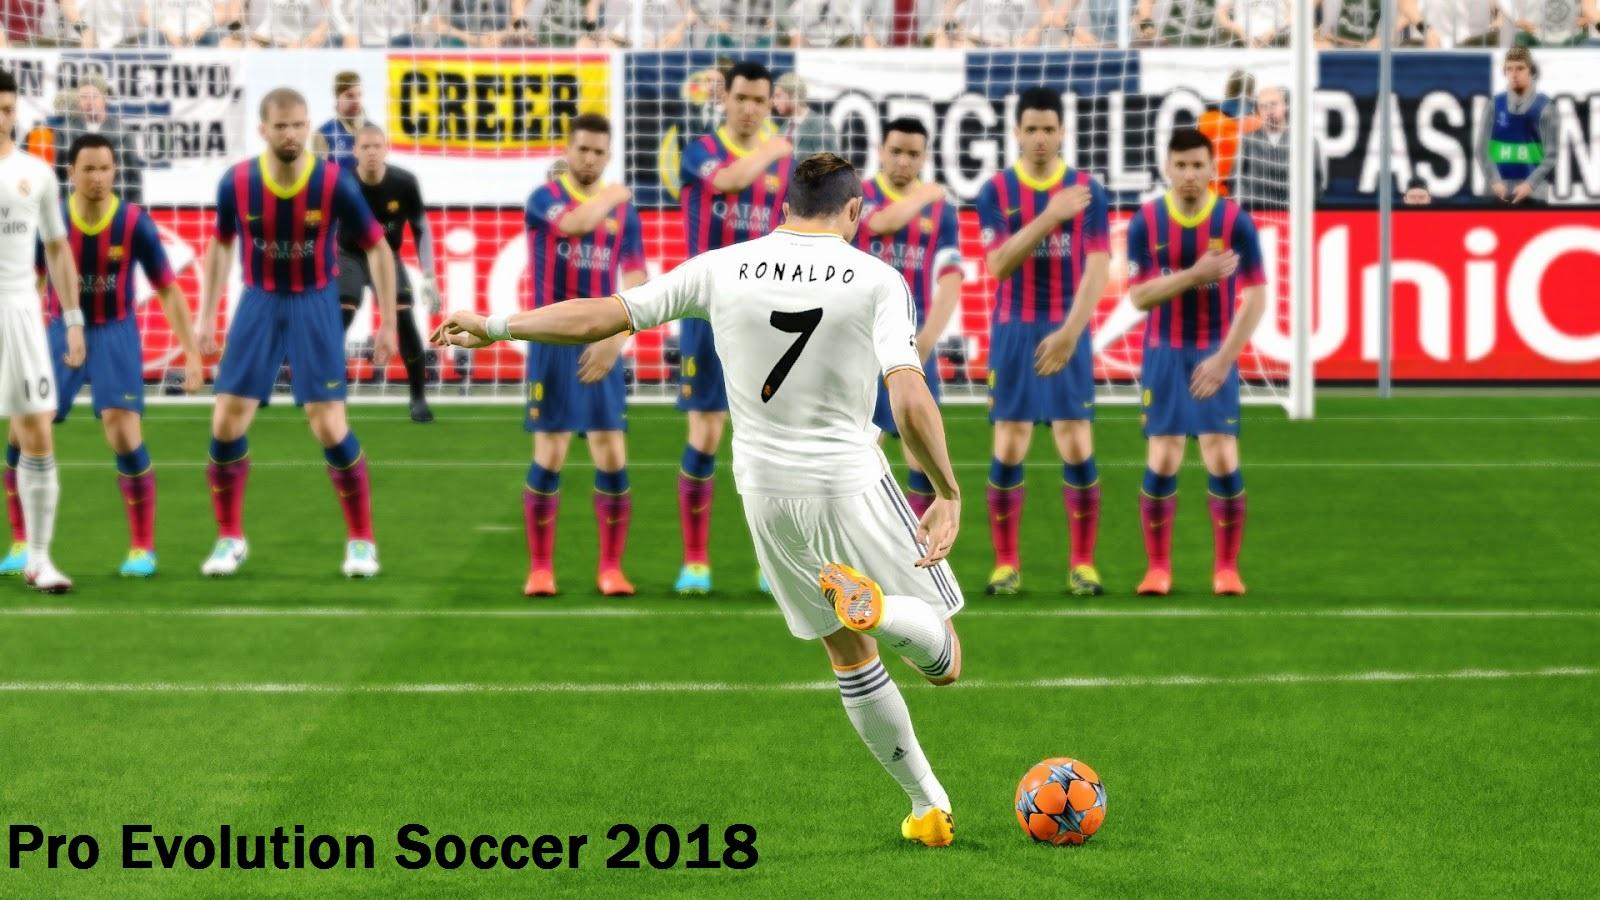 93+] Pro Evolution Soccer 2018 Wallpapers on WallpaperSafari